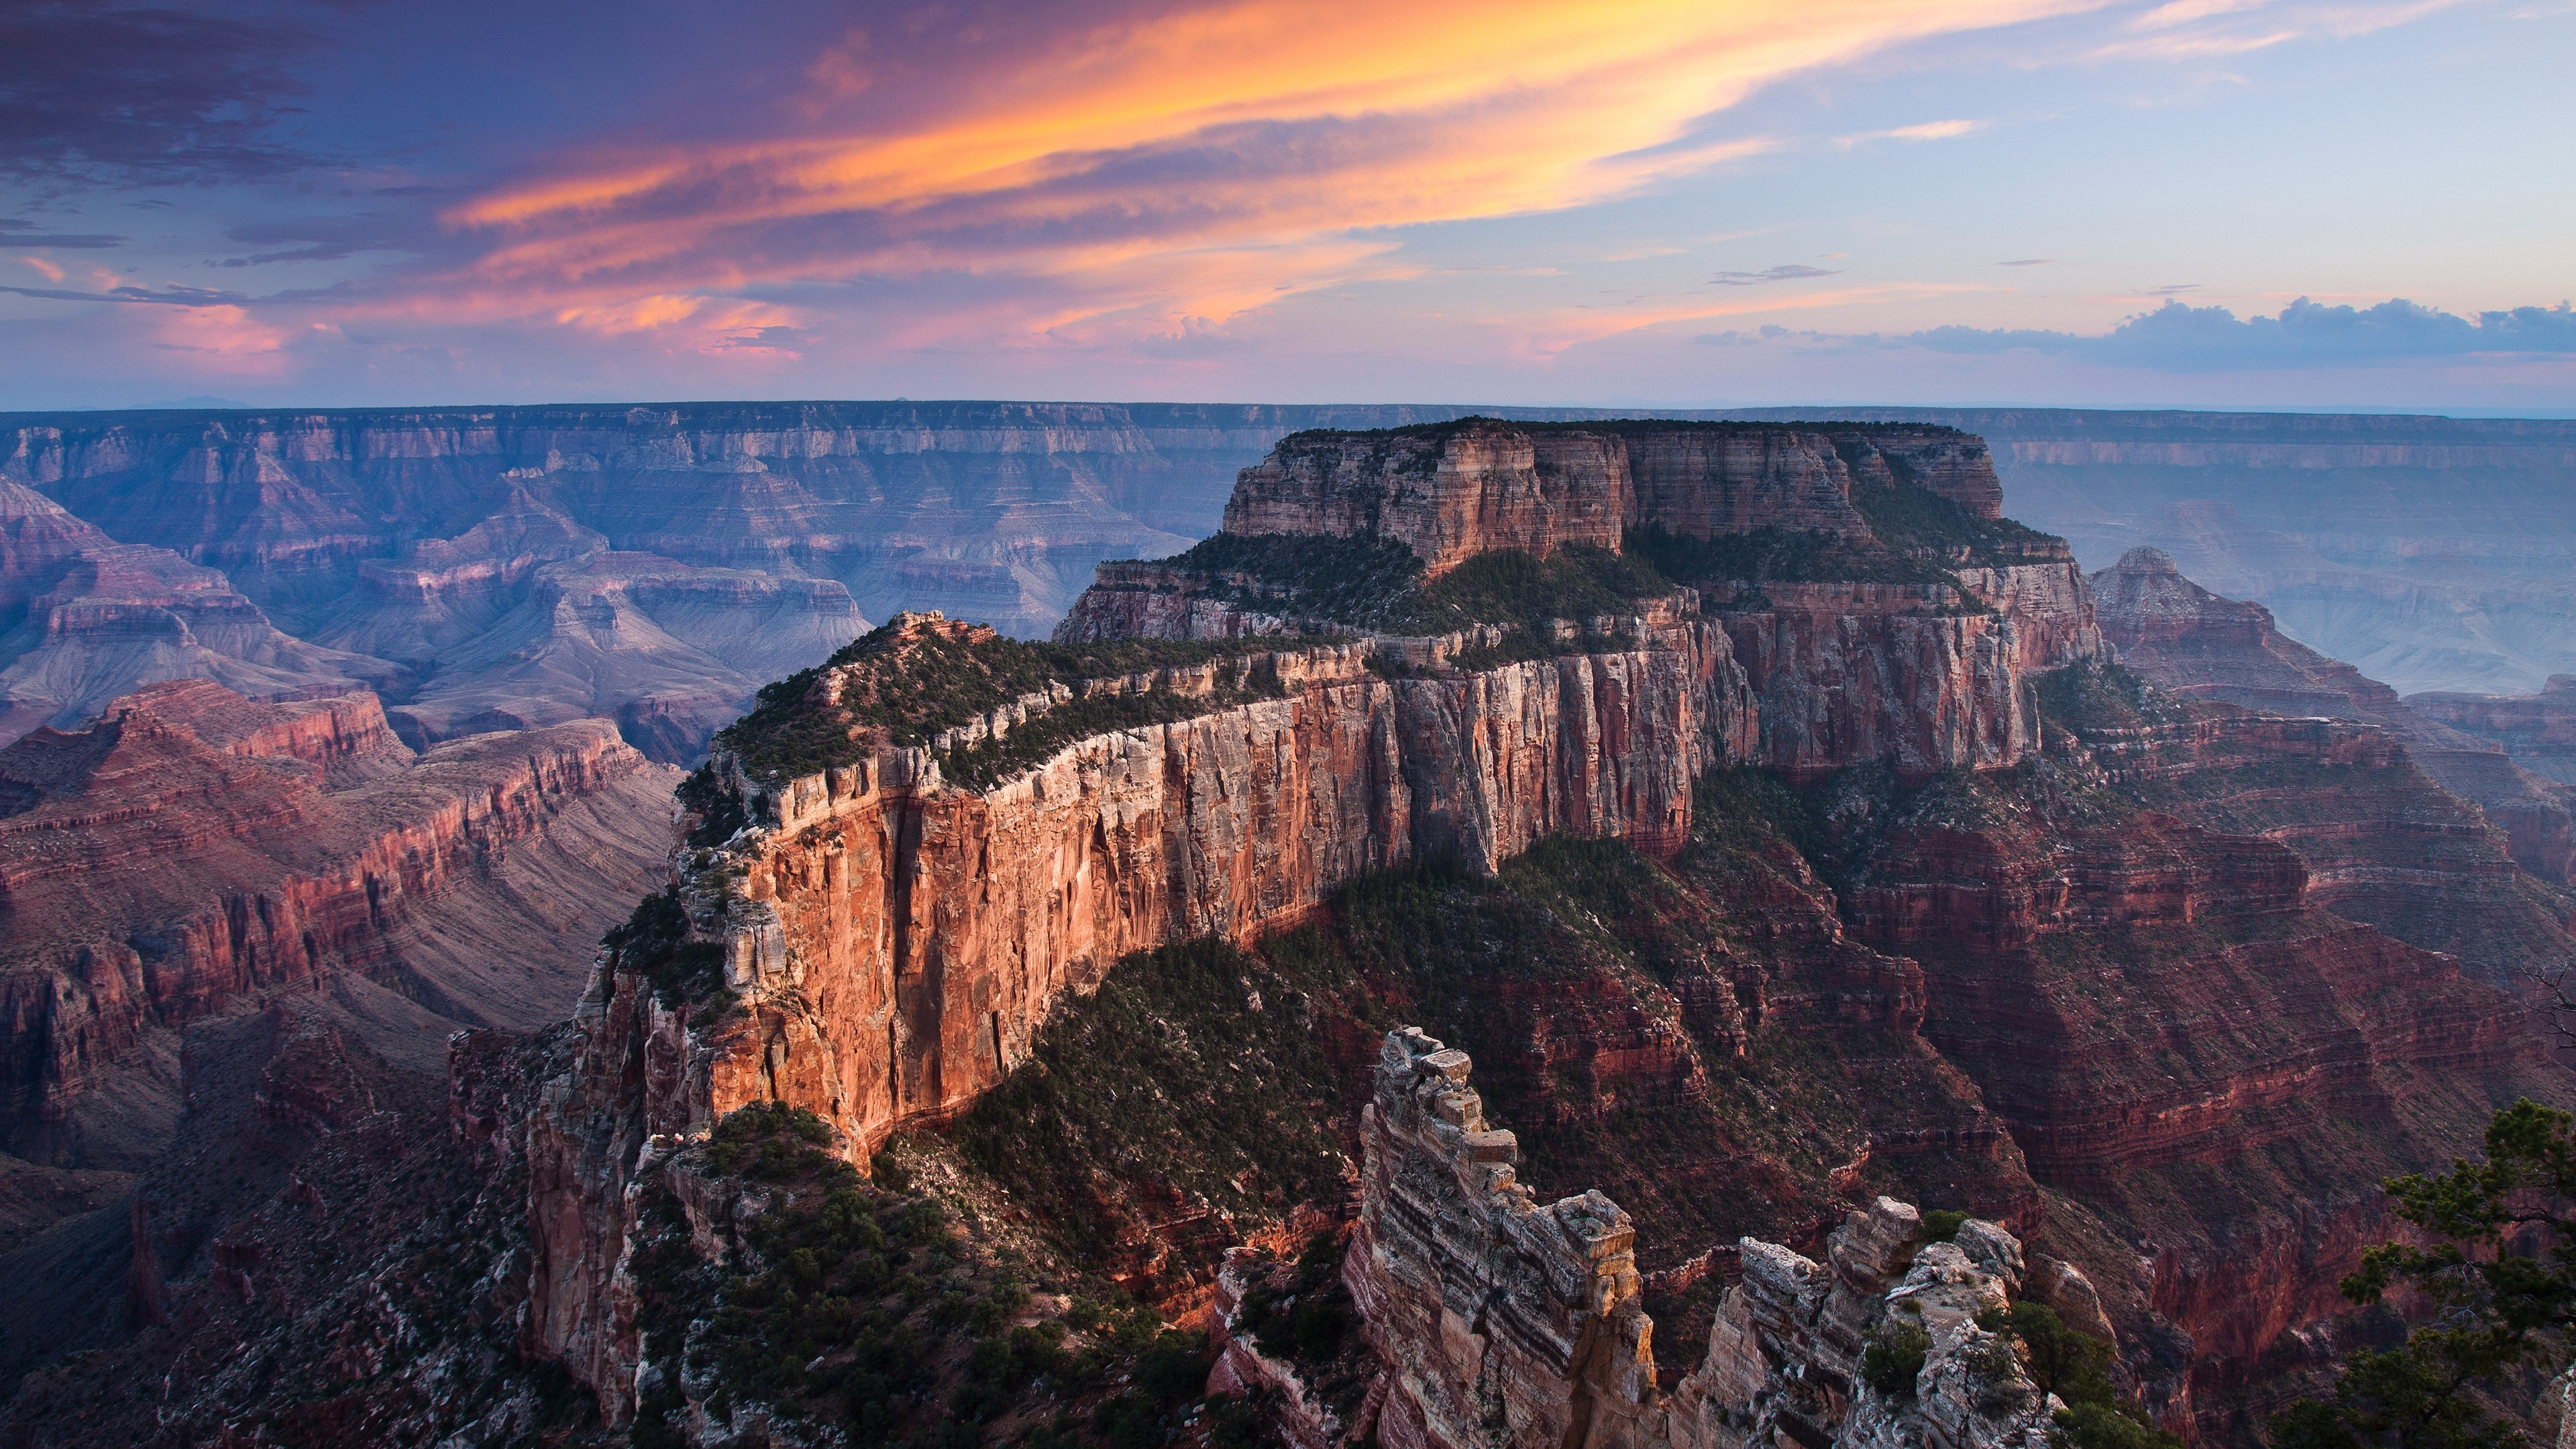 grand canyon national park 1538068980 - Grand Canyon National Park - world wallpapers, nature wallpapers, national park wallpapers, grand canyon wallpapers